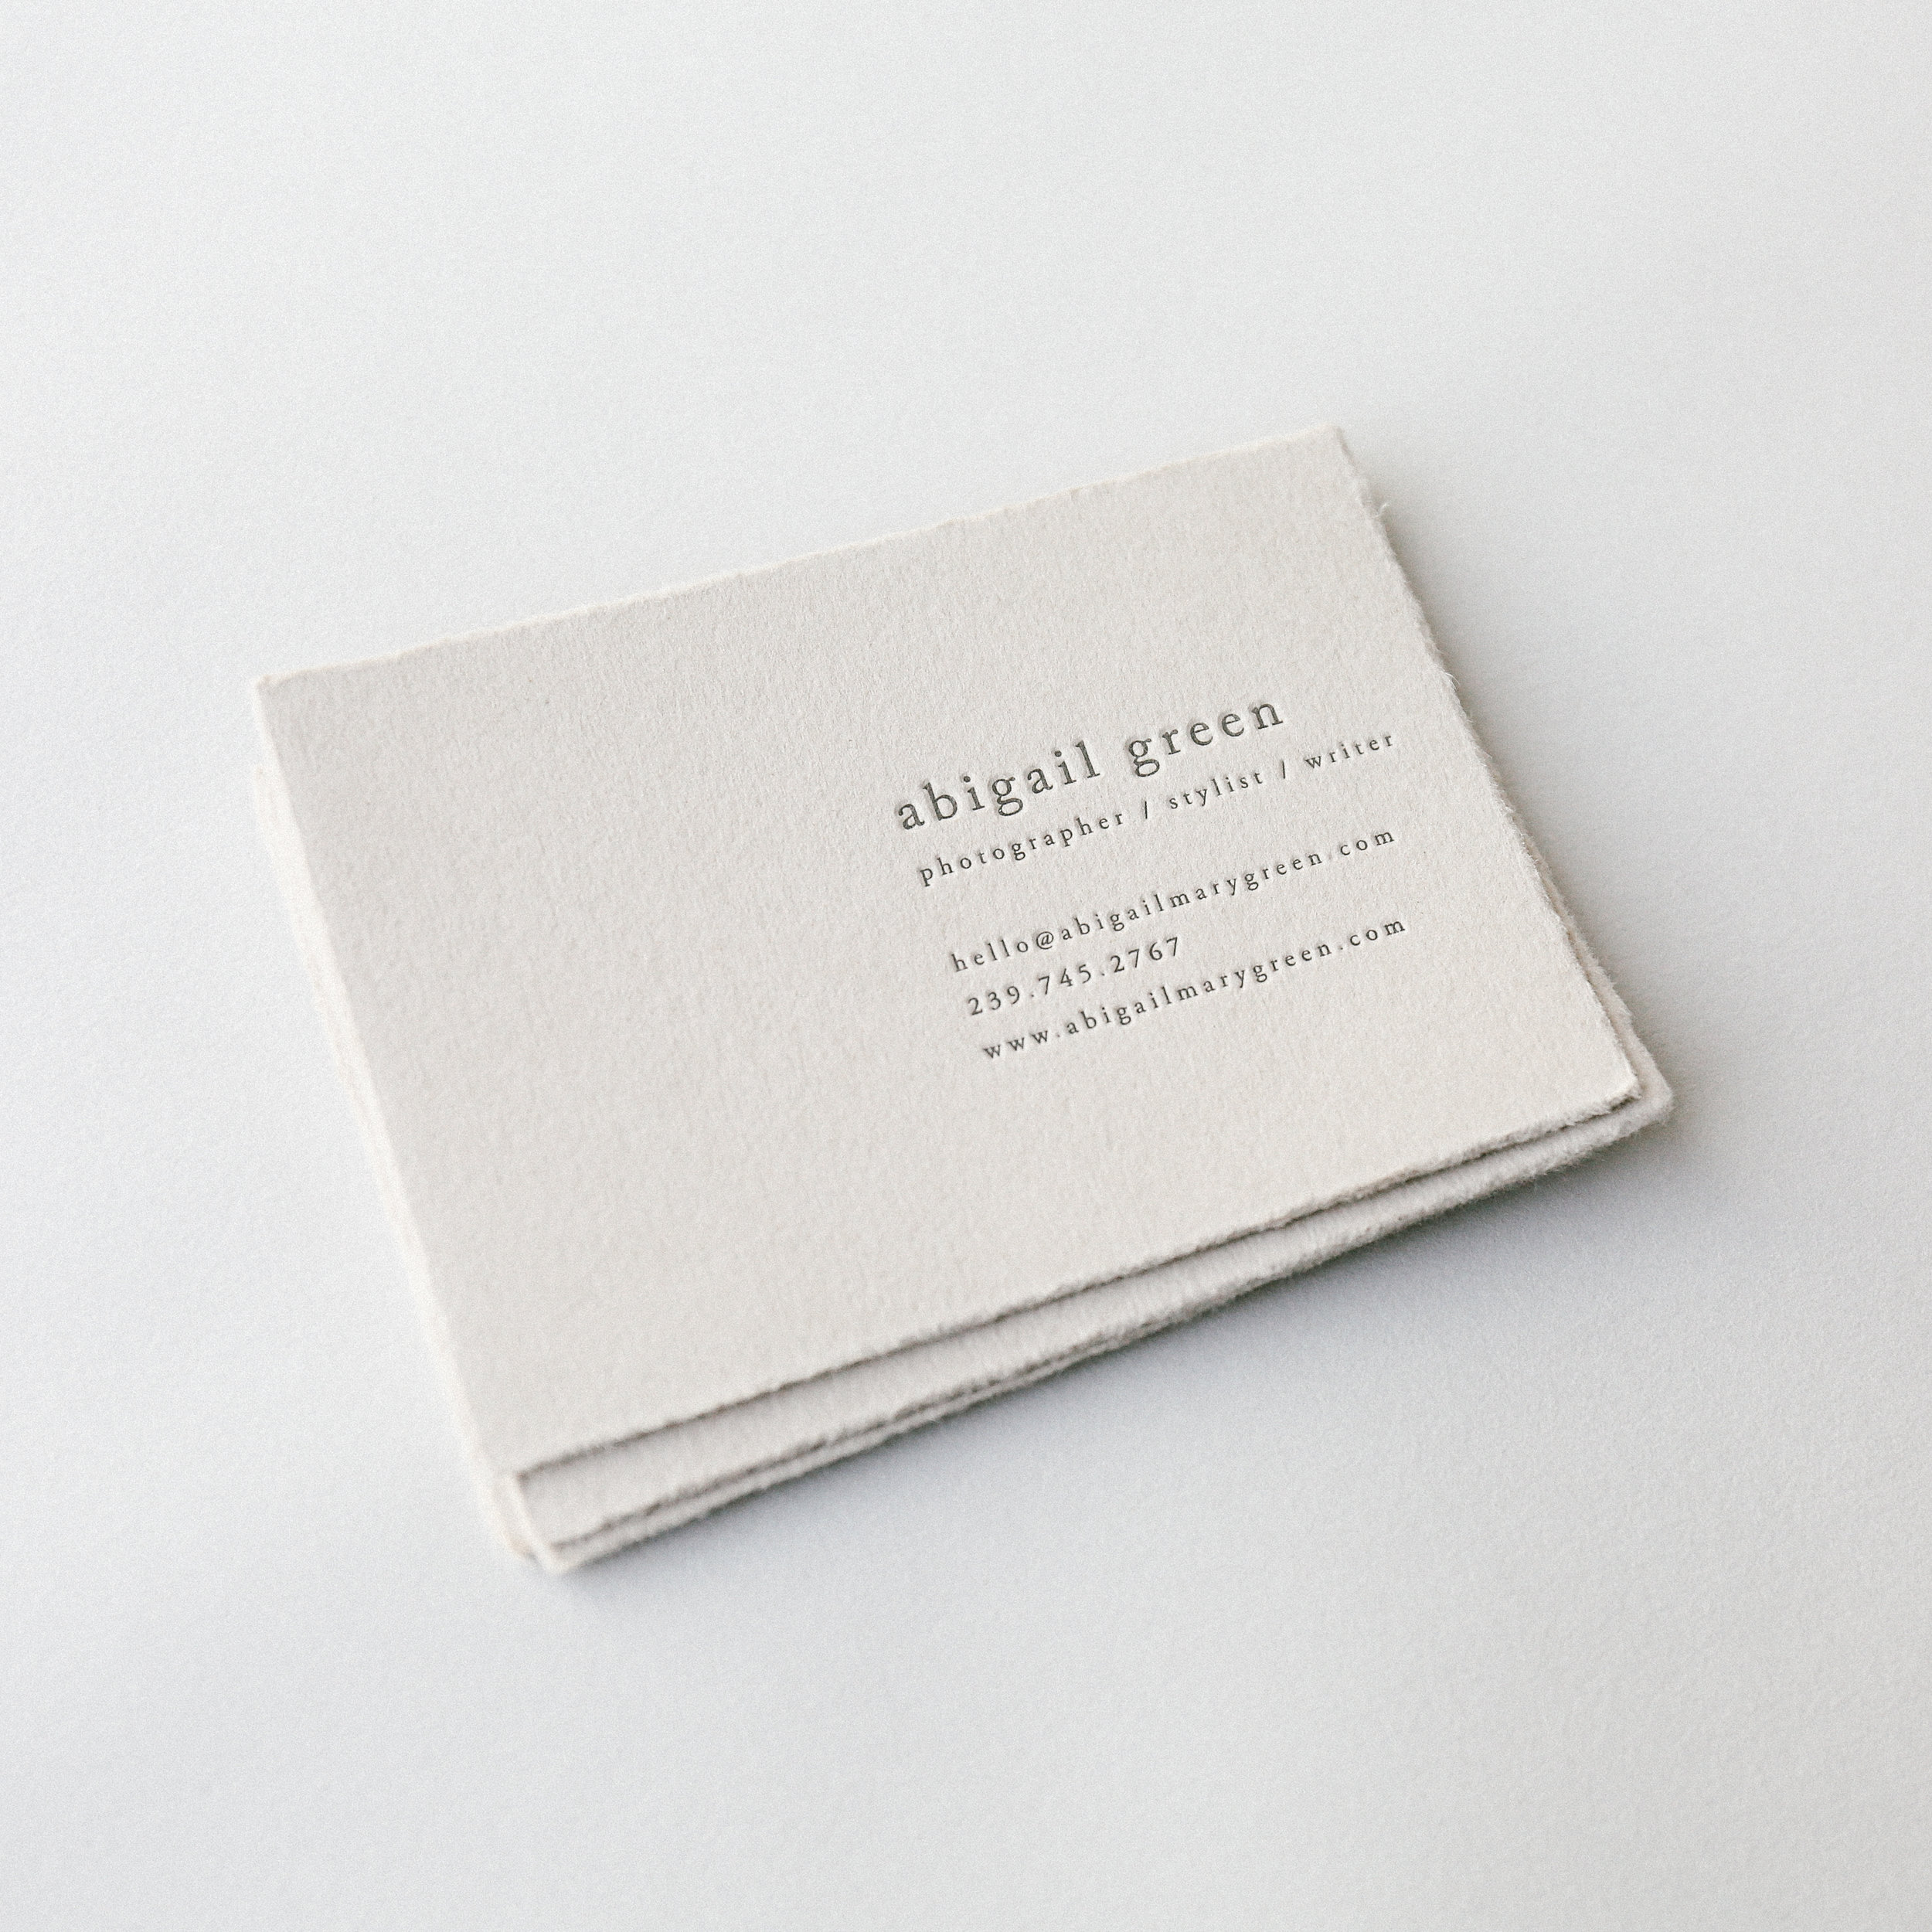 Abigail_BizCard2-3.jpg